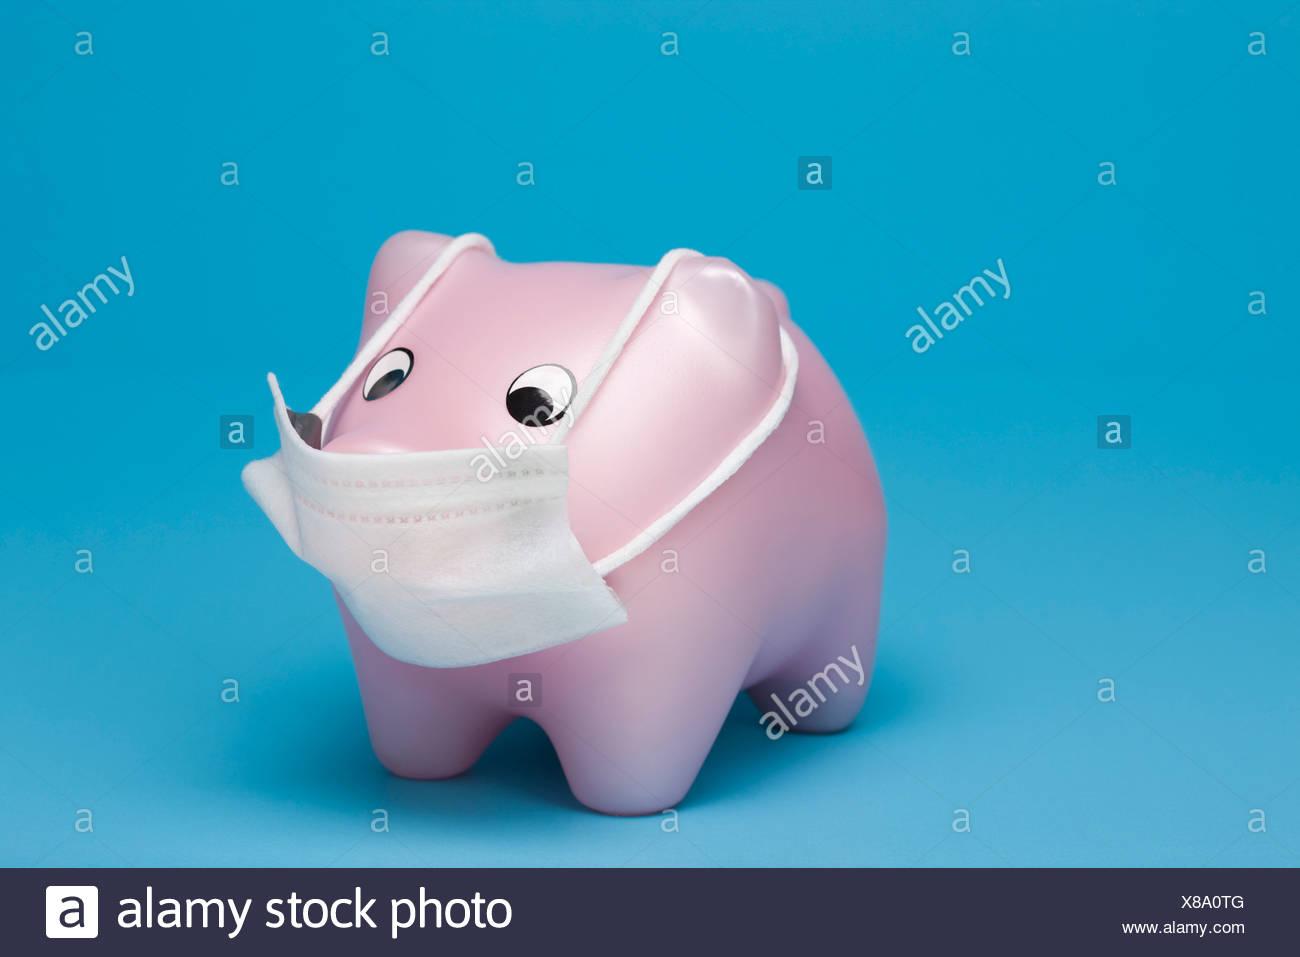 Swine flu concept, toy pig wearing flu mask - Stock Image